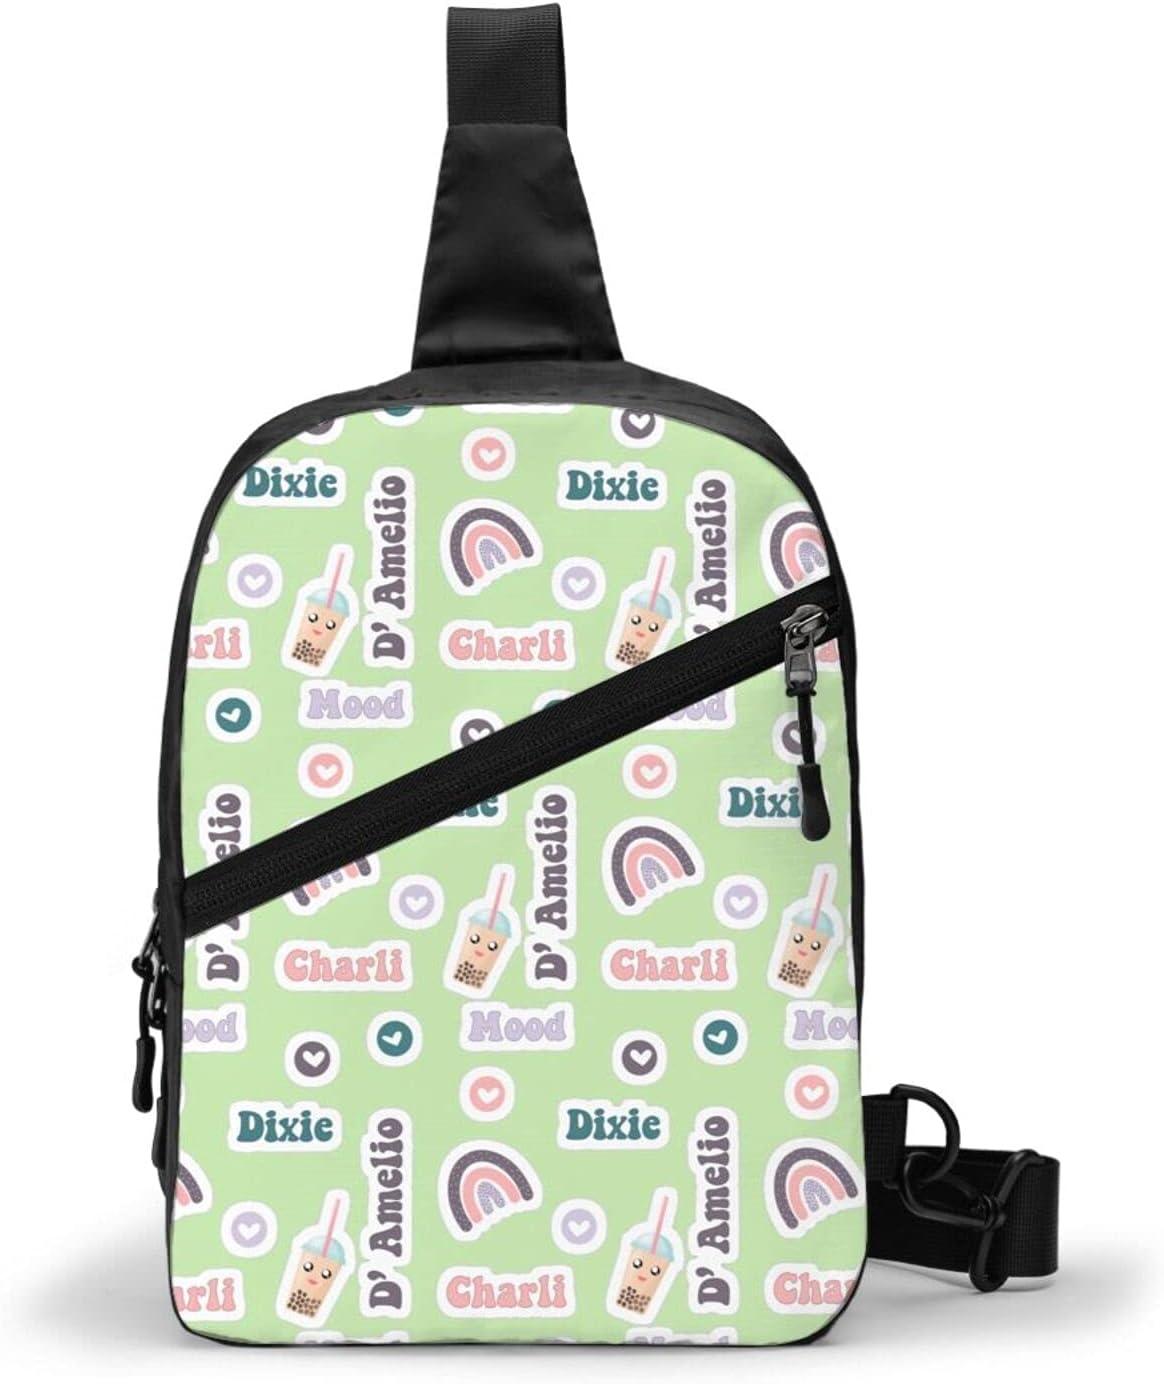 Charli Damelio Chest Department store Package Sling Multipurpo Large Bag Rapid rise Capacity